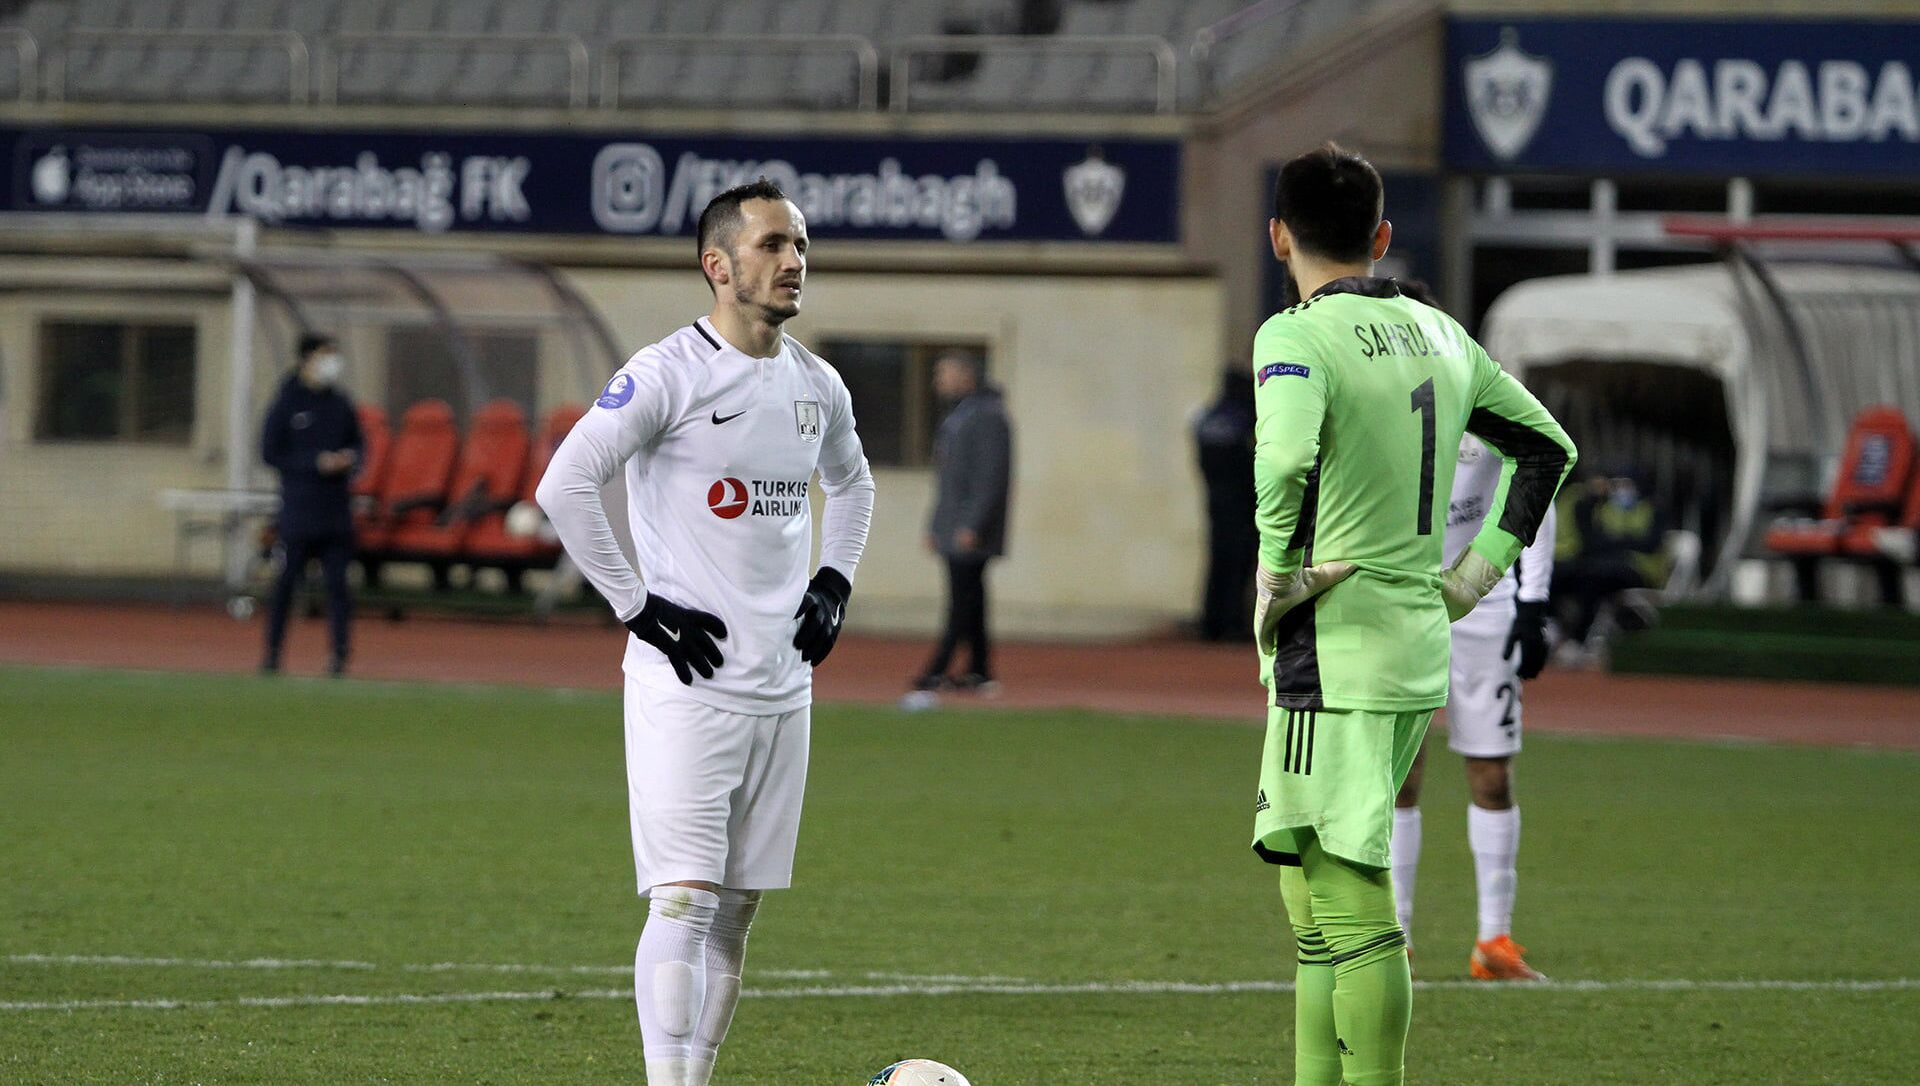 Матч между ФК Карабах и Нетфчи  - Sputnik Азербайджан, 1920, 16.02.2021